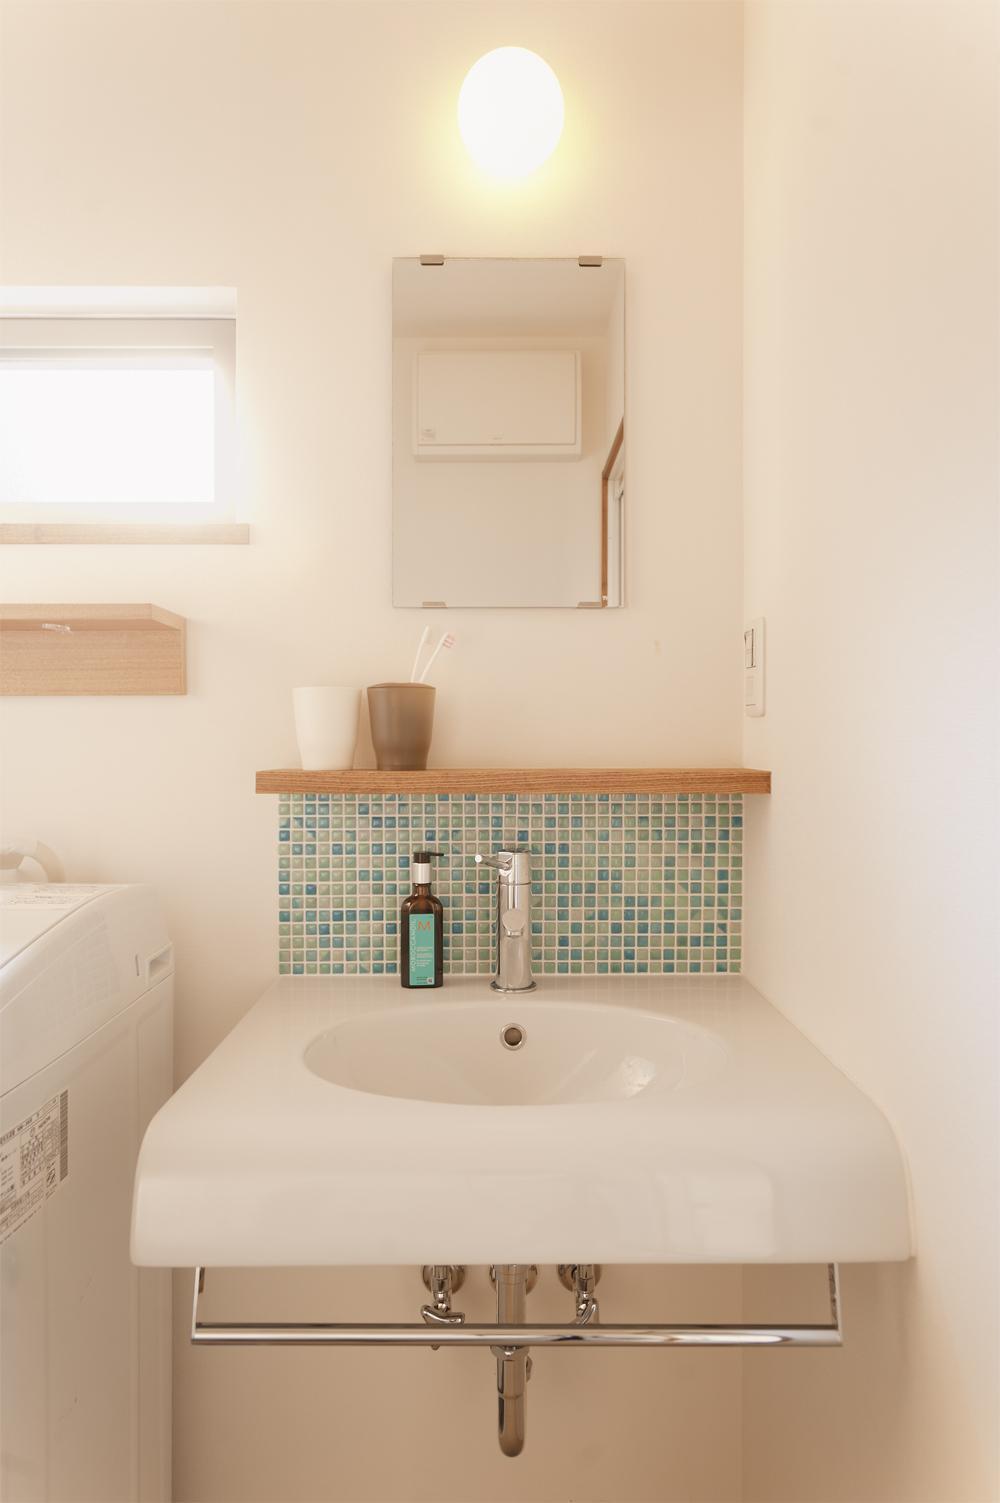 T邸・一番気持ちの良い場所をLDKへの部屋 ブルーのモザイクタイルの洗面台